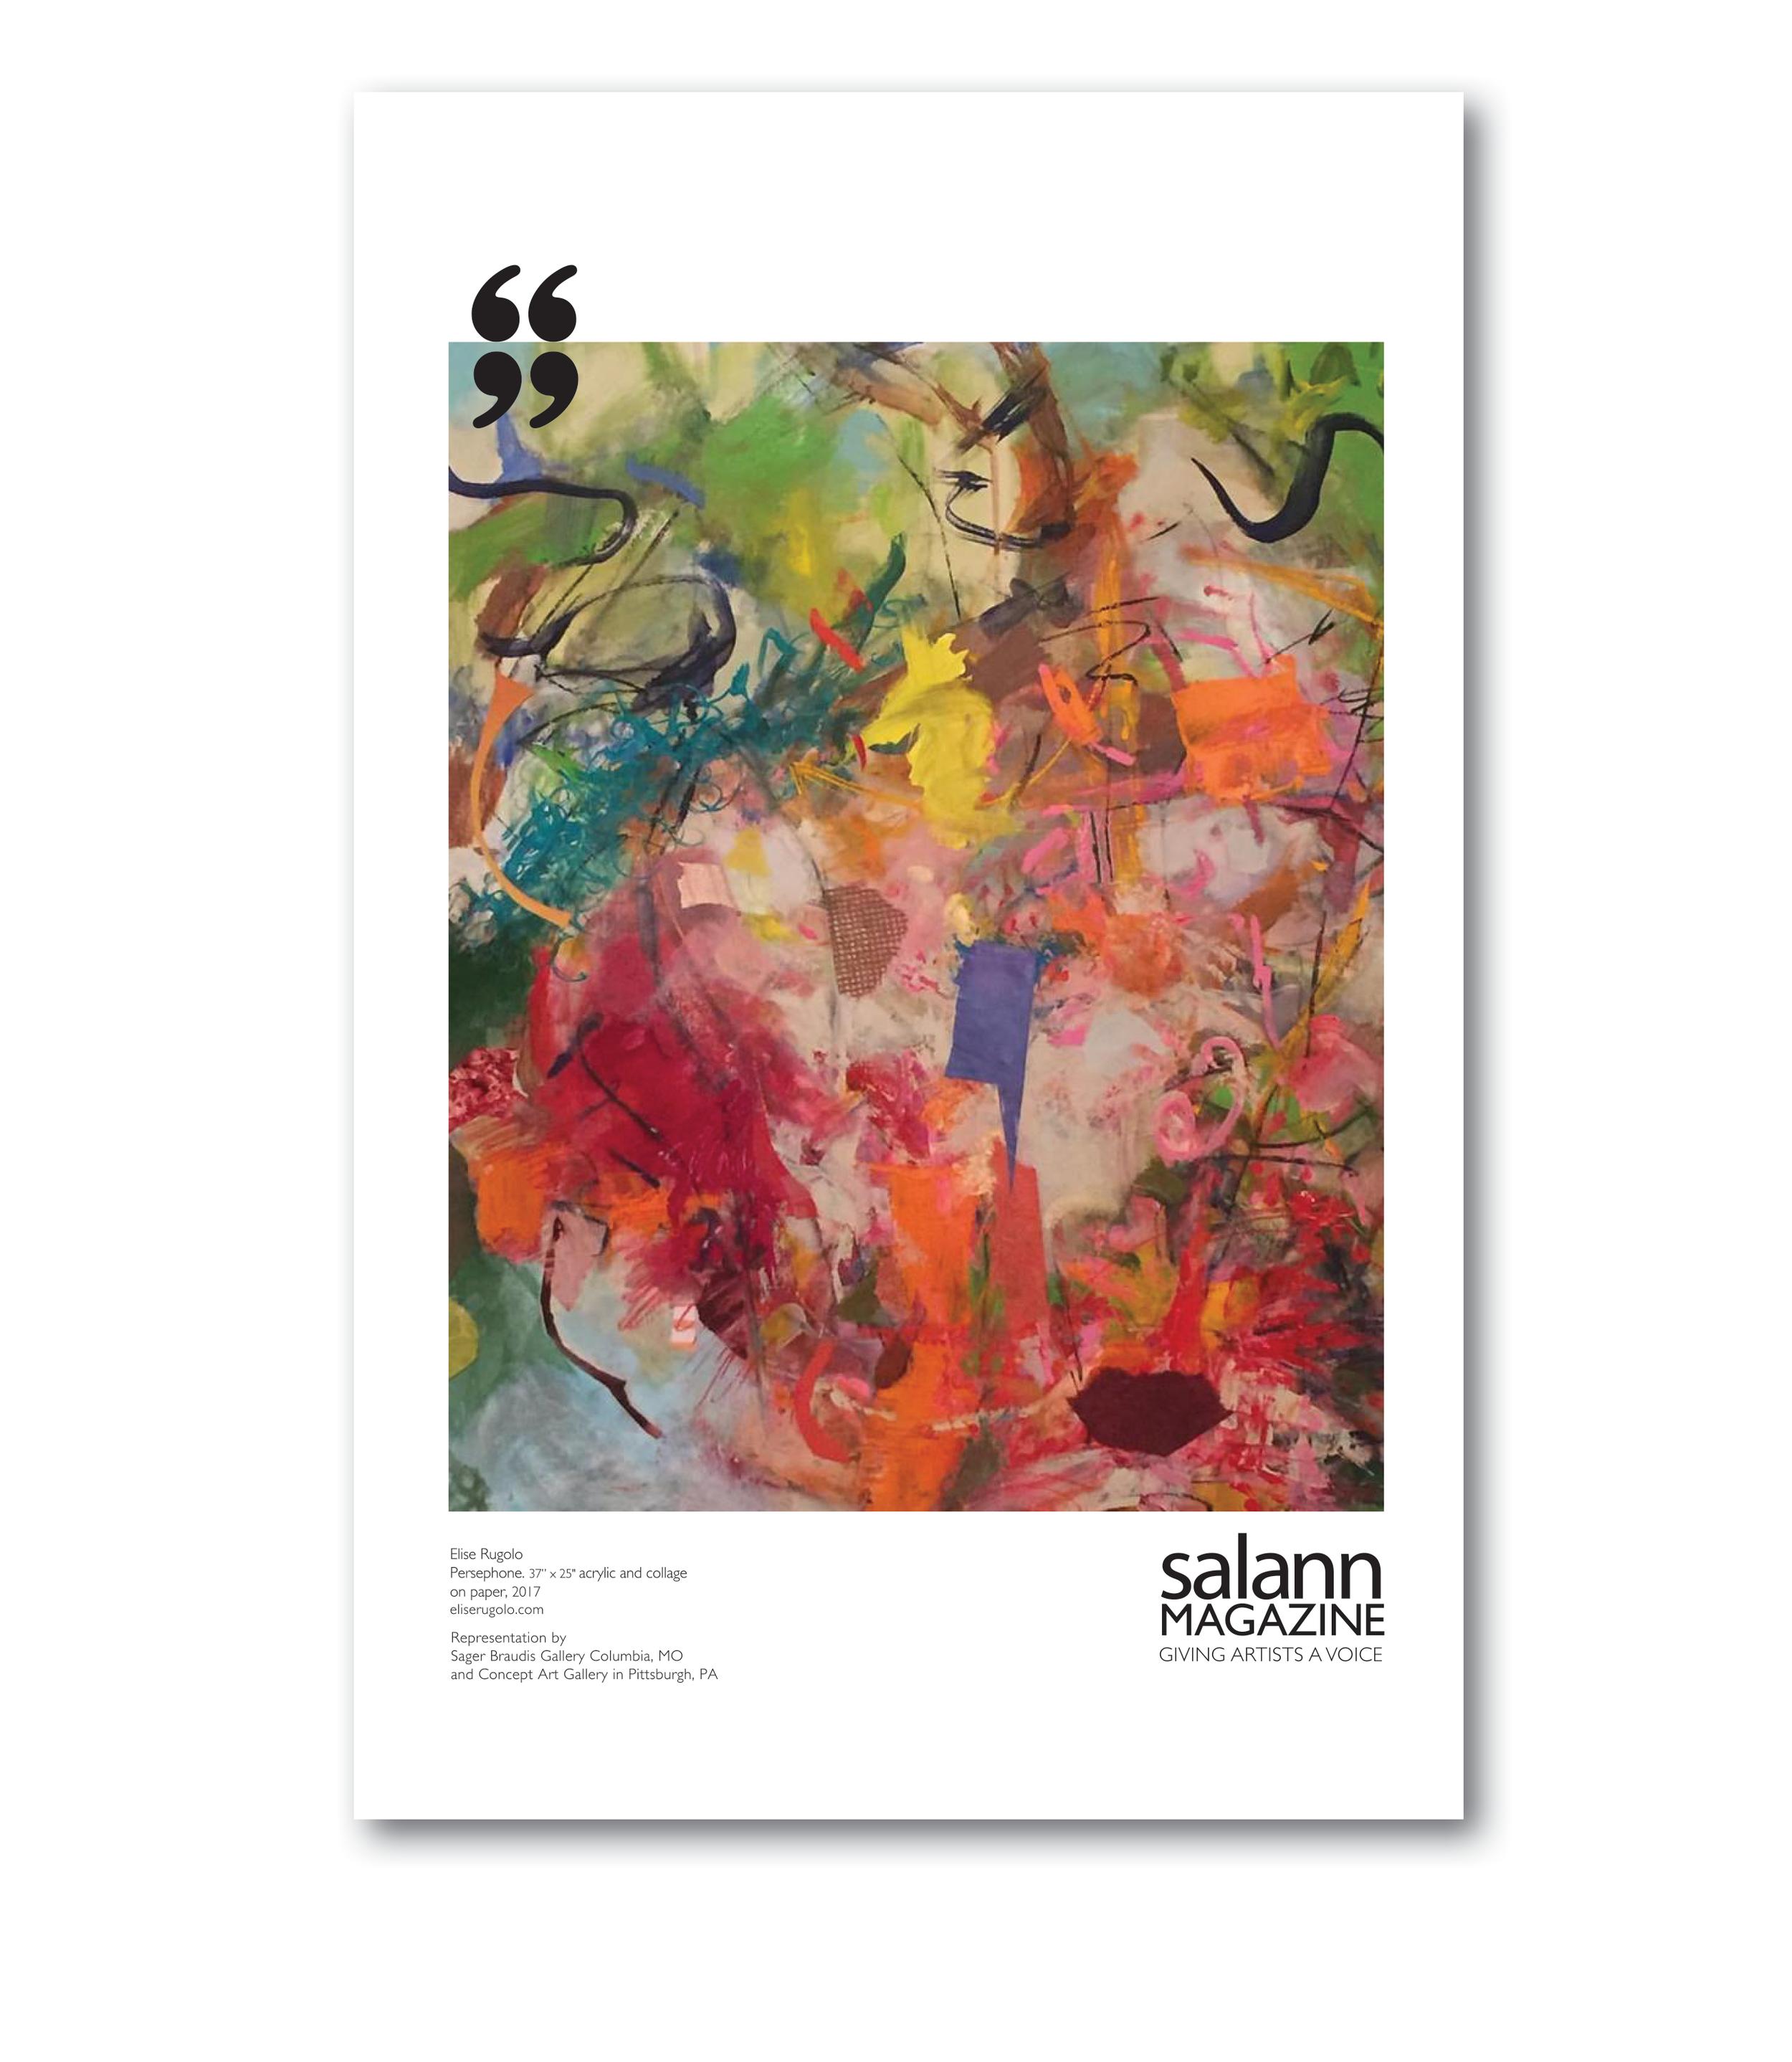 SalannMagazineCoverJulian2ndEditionWEB copy.png